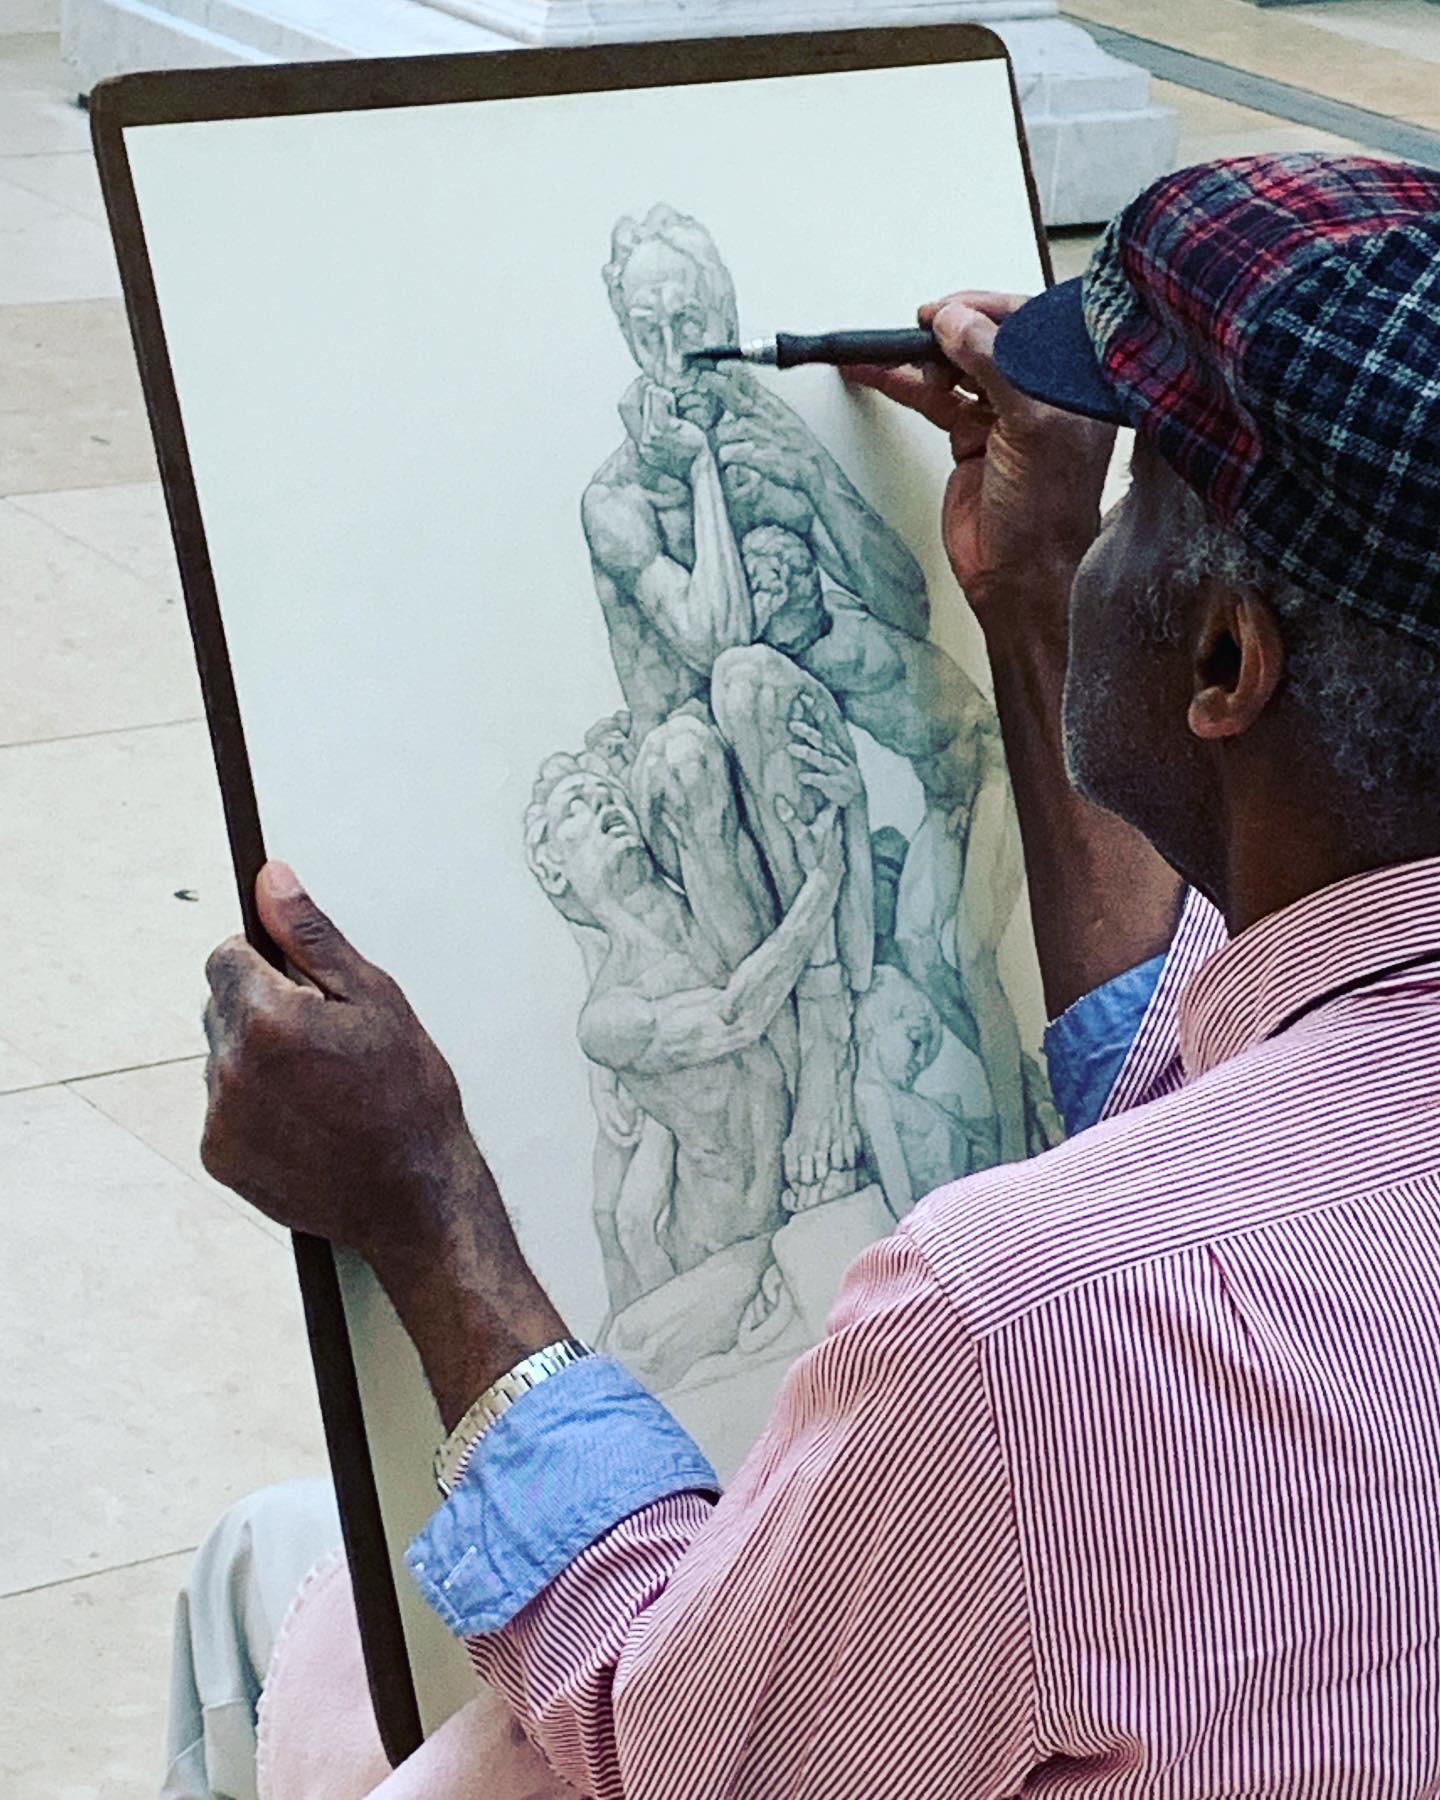 Citizen Photos: Man's stunning portrait of Met Museum artifact catches our eye